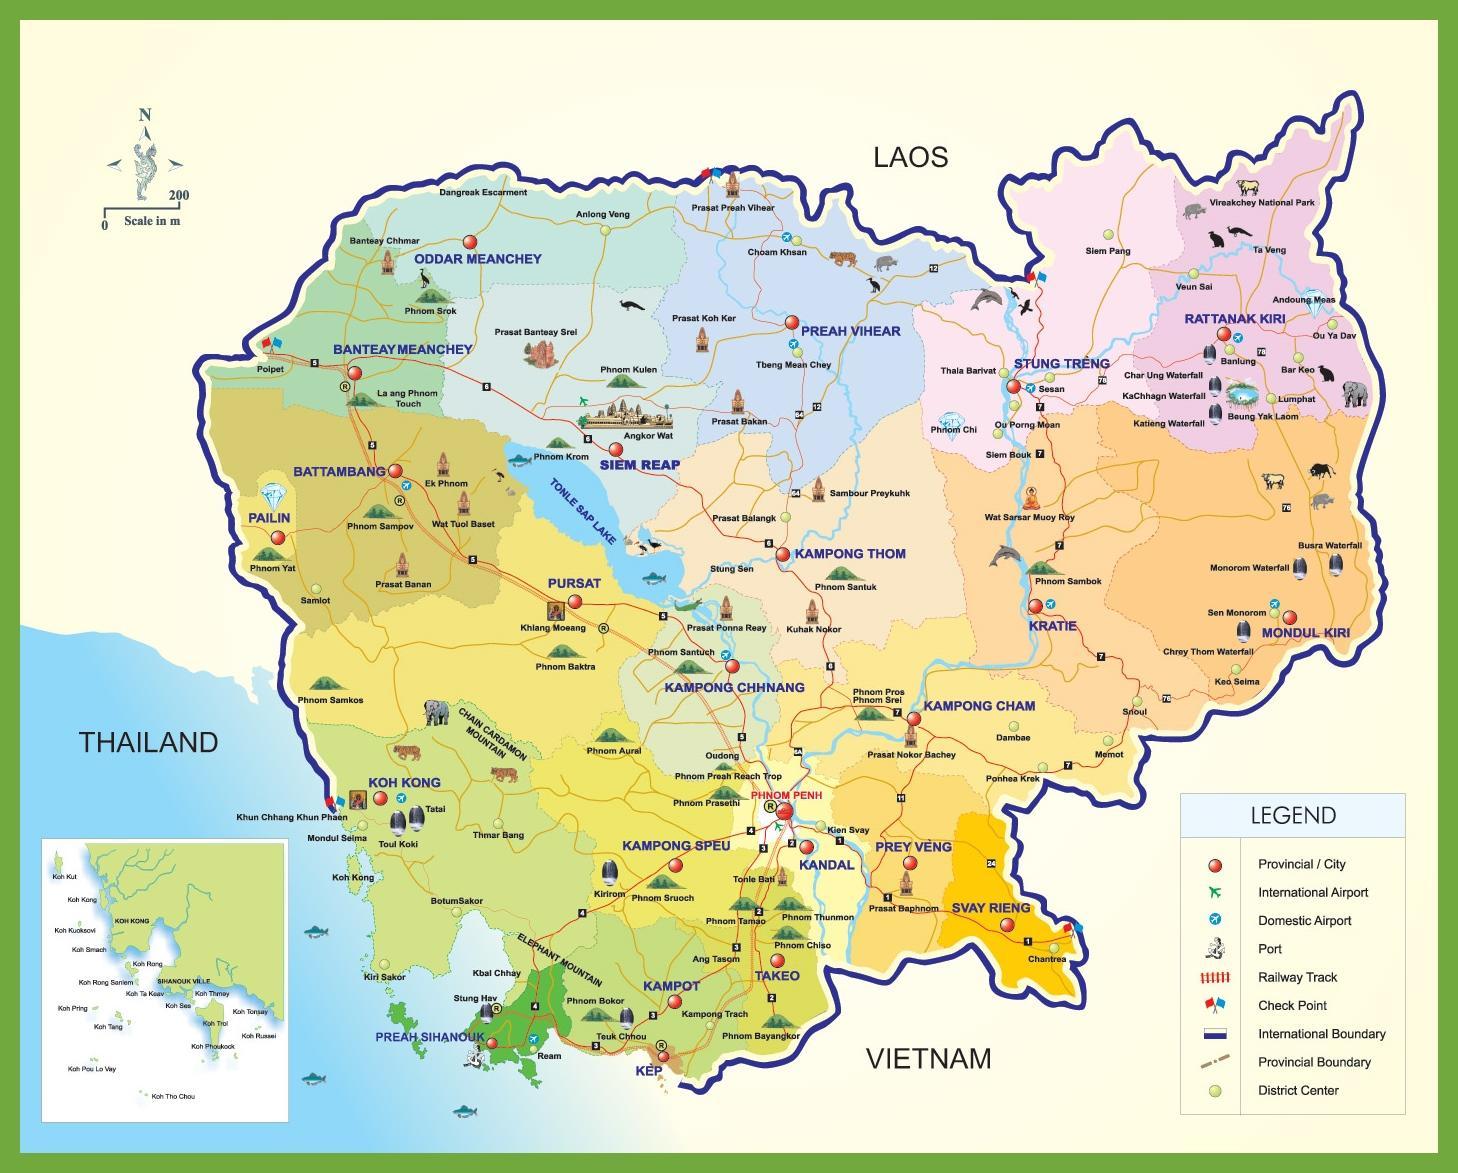 Carte Touristique Asie.Cambodge Carte Touristique Cambodge Carte De Voyage Asie